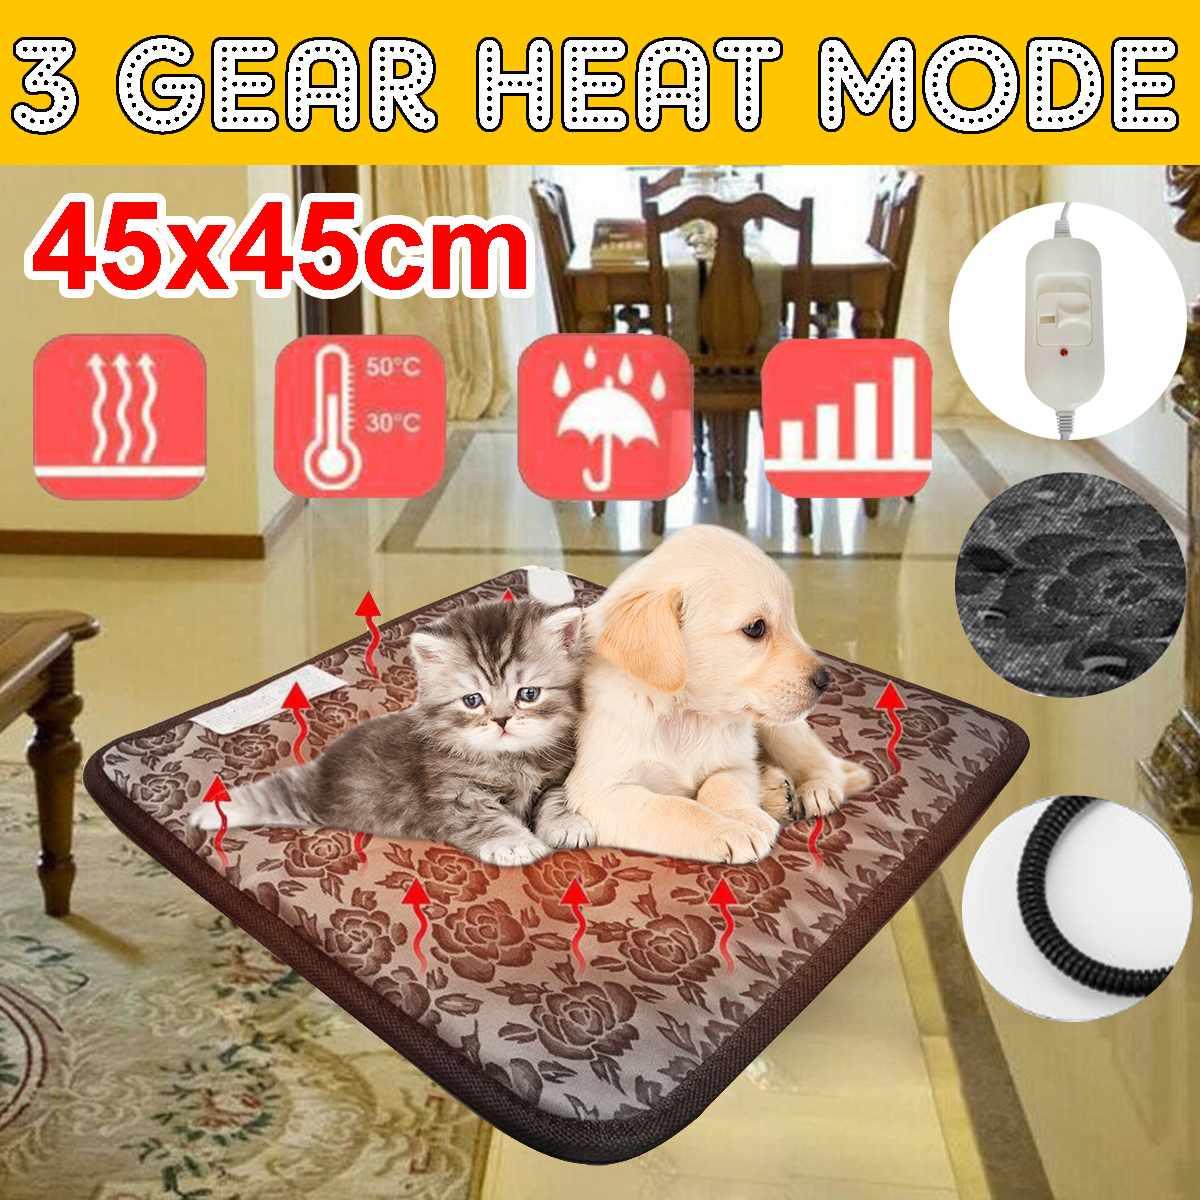 Winter Warm Electric Heating Pad 110V 50Hz Pet Dog Cat Electric Heating Pad Three-speed Temperature Animal Carpet 45x45cm